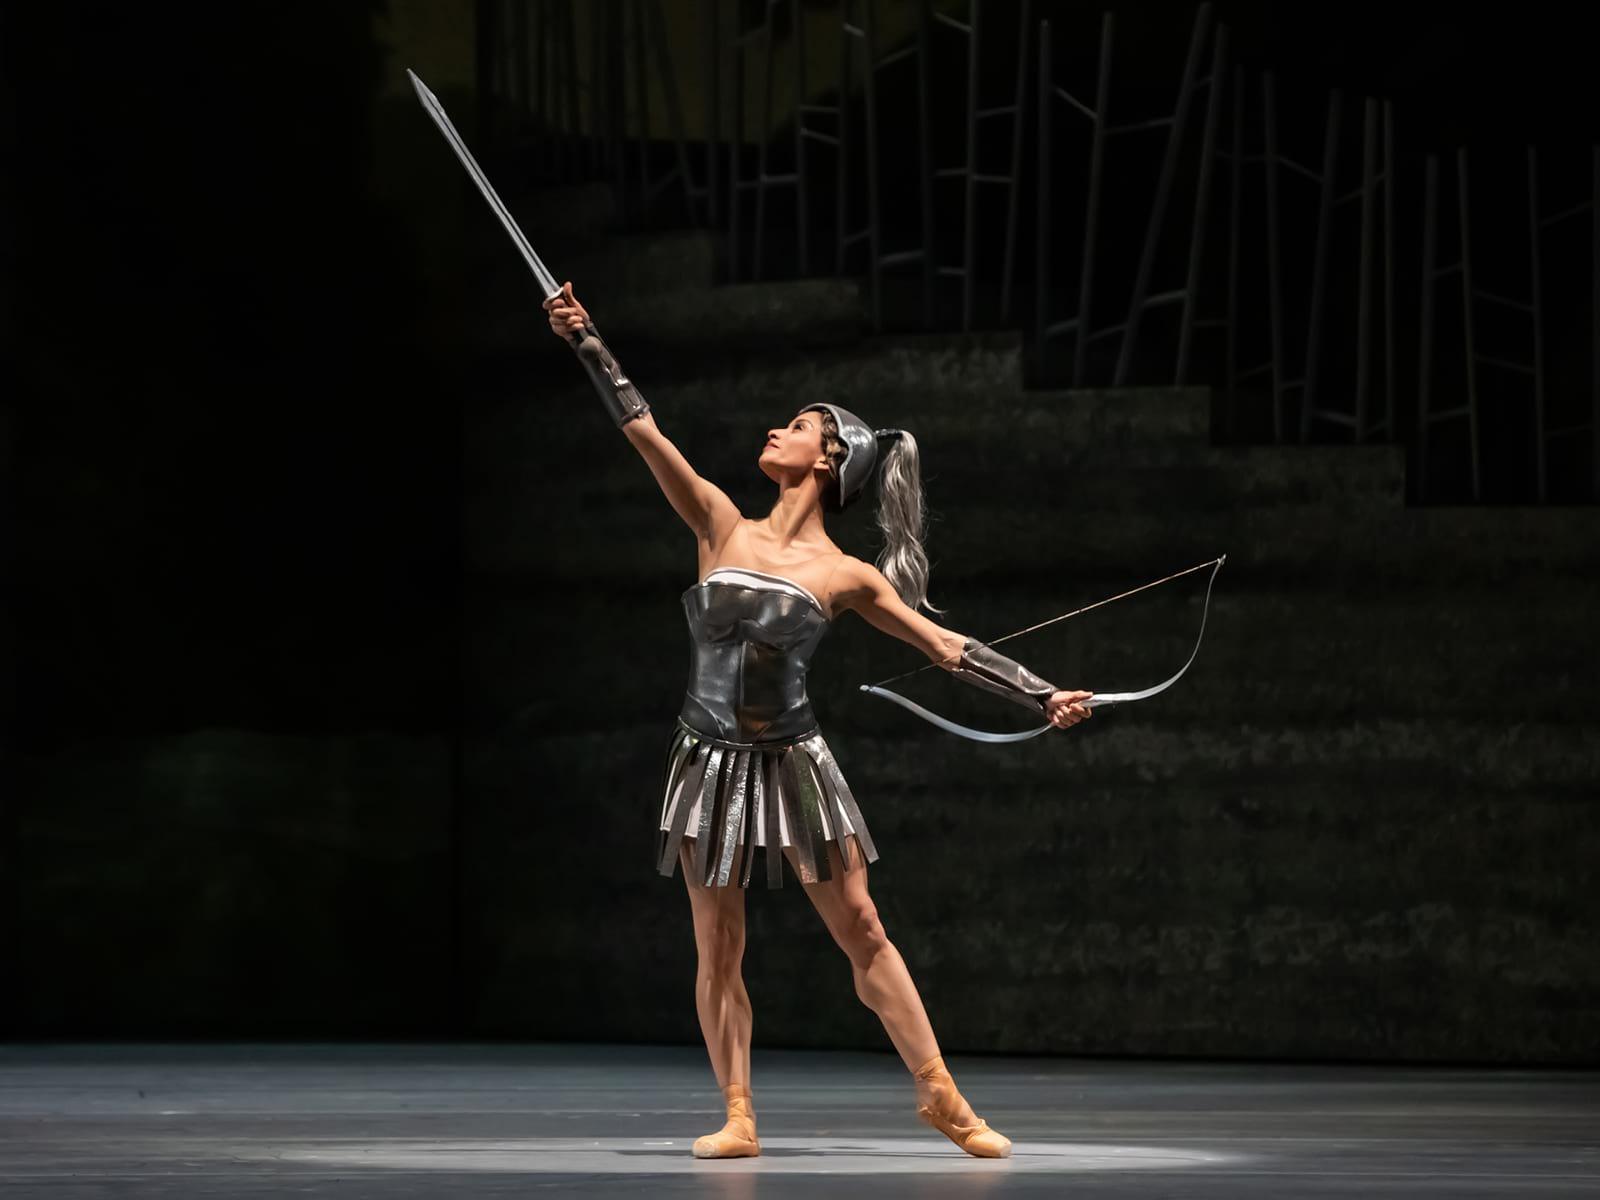 sylvia the australian ballet